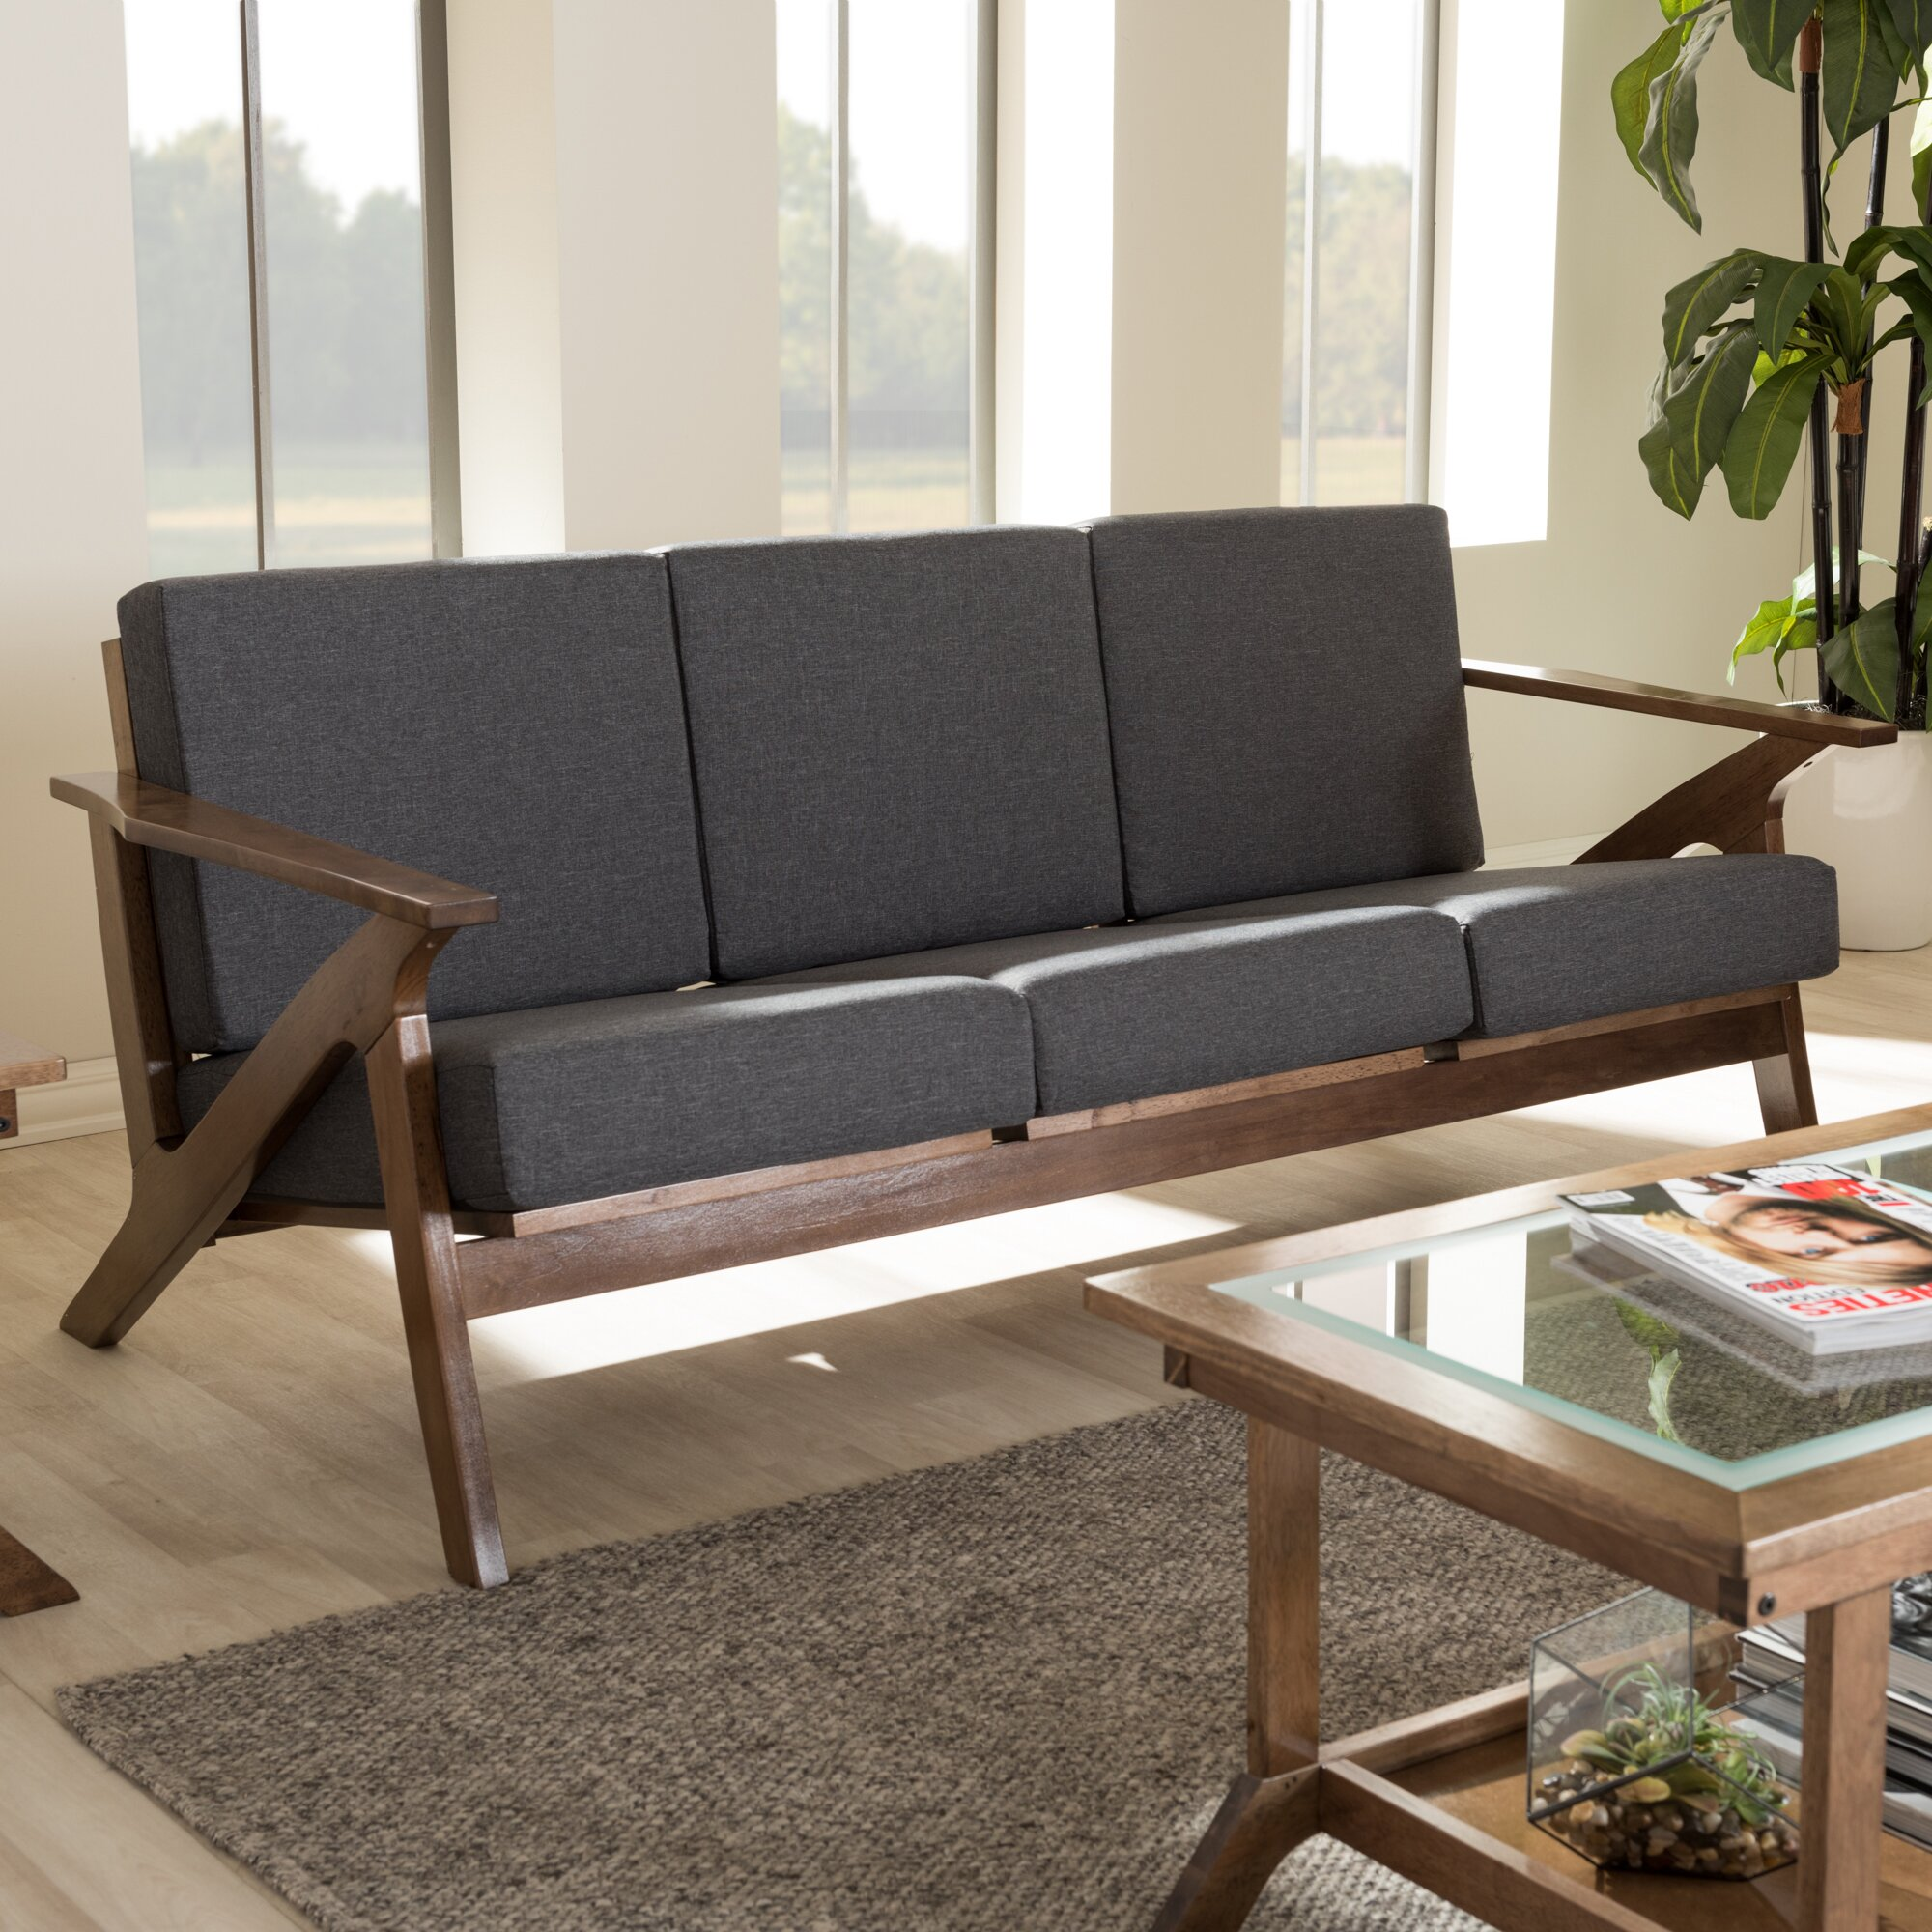 Wholesale interiors baxton studio mid century modern sofa for Baxton studio